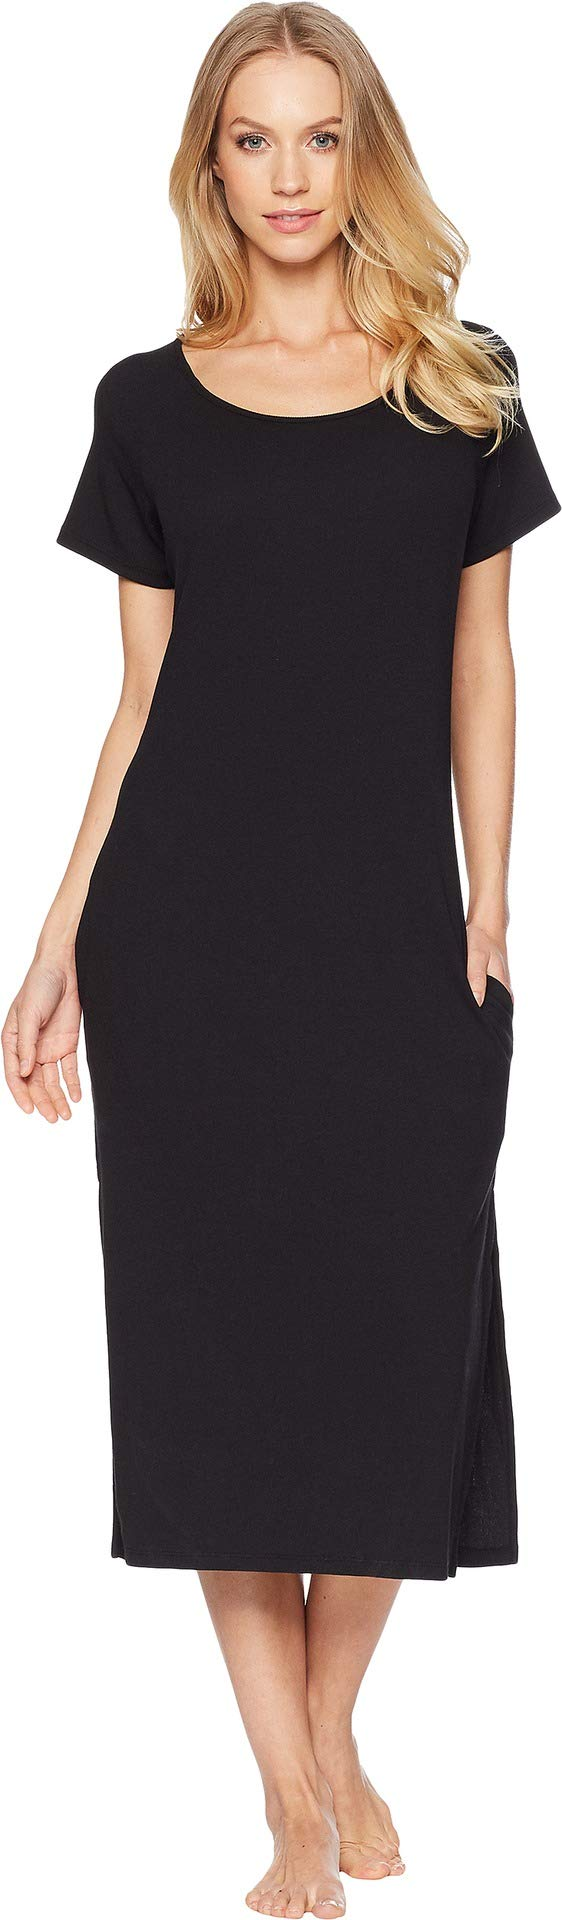 Skin Women's Nikita Dress Black 0 by Skin Industries